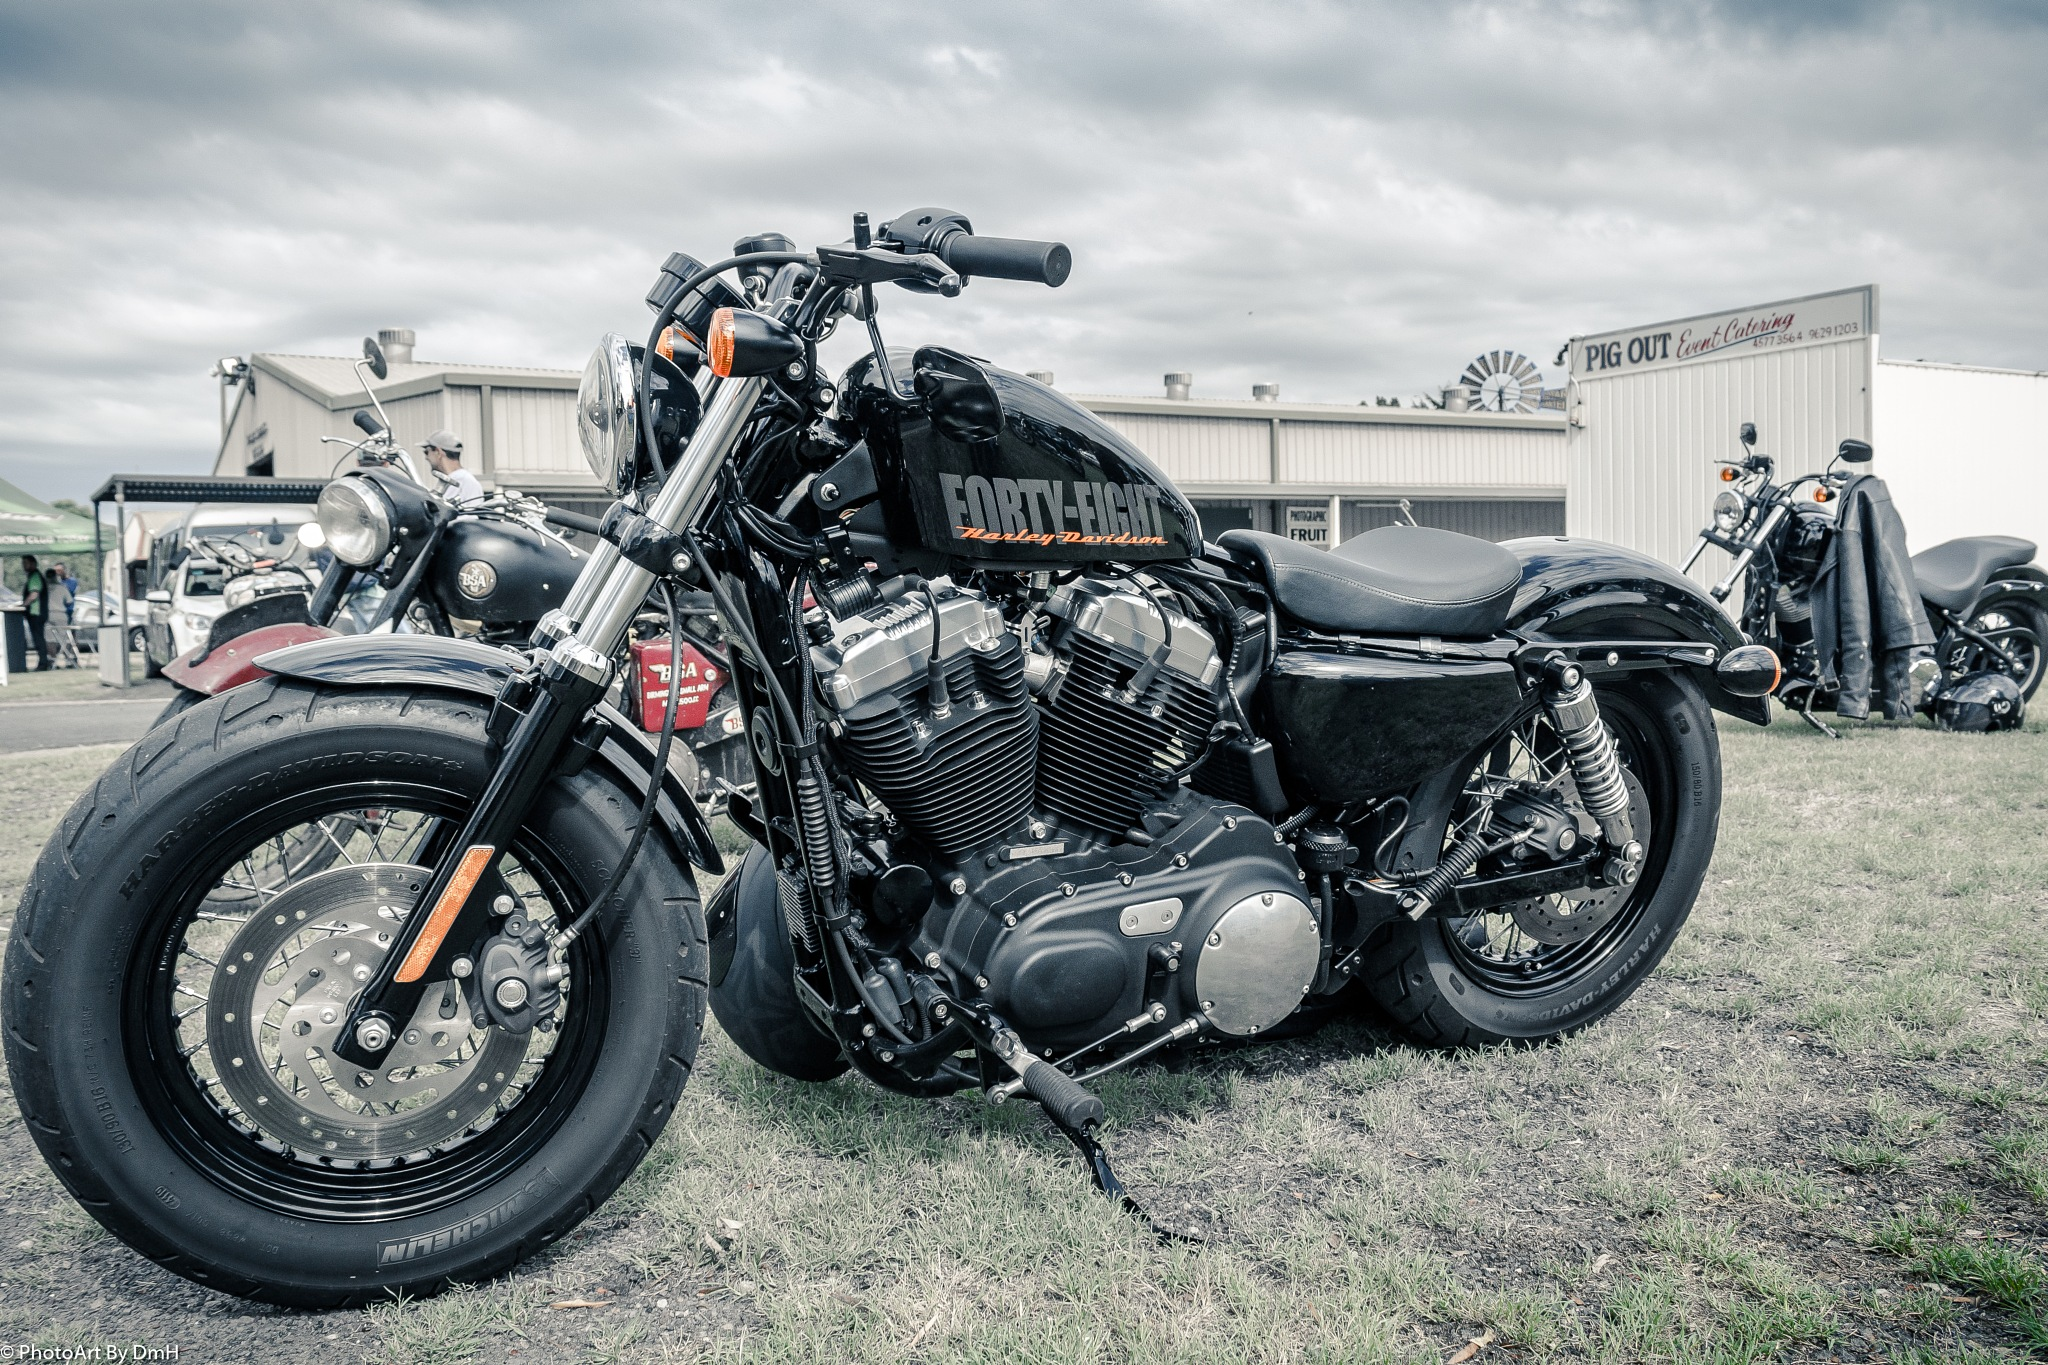 Harley Davidson.  by PhotoArt By DmH